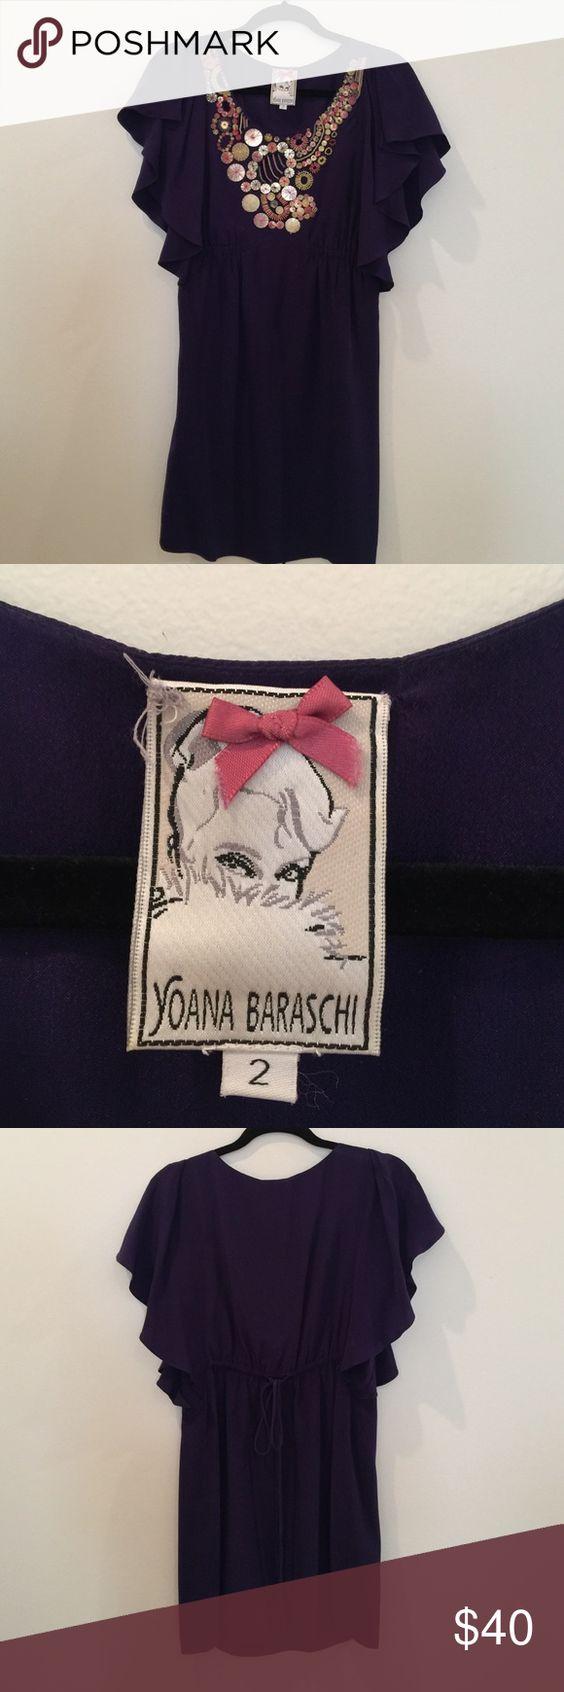 Anthropologie Yoana Baraschi Embellished Dress Good condition, Size 2, flutter sleeves, tie back Anthropologie Dresses